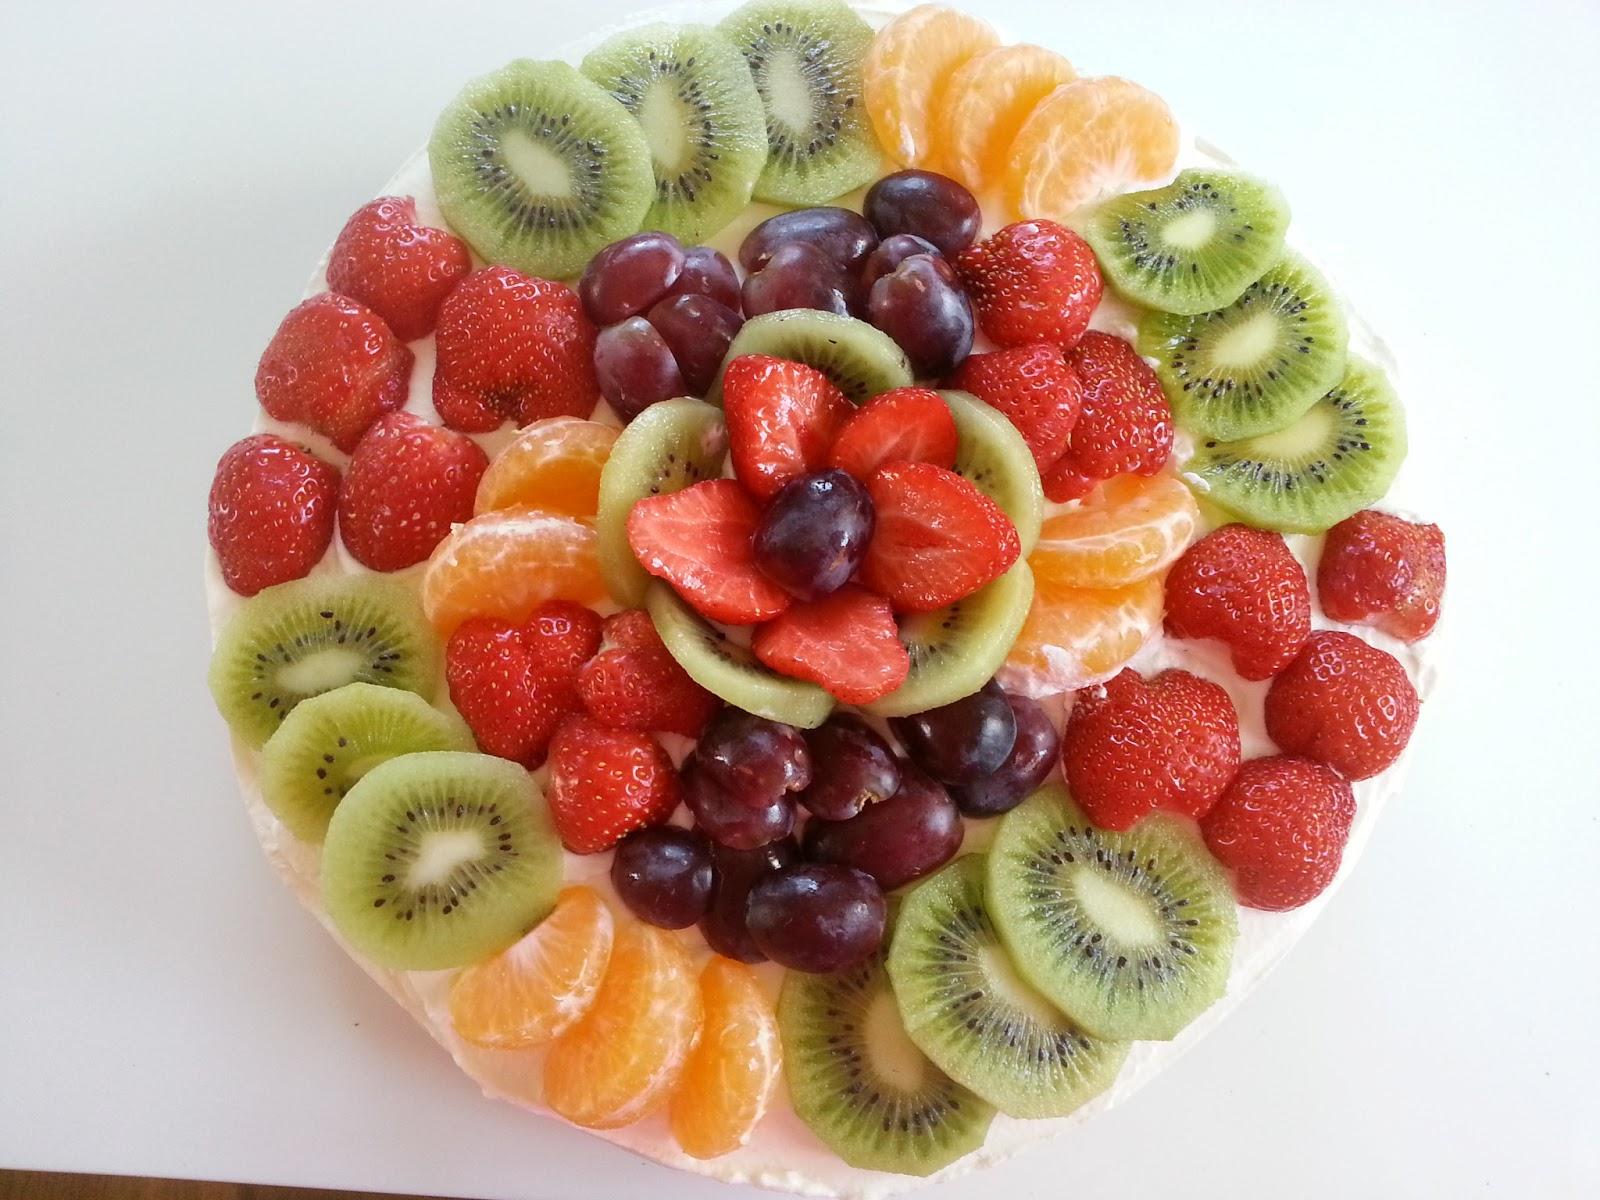 nyttig tårta utan socker